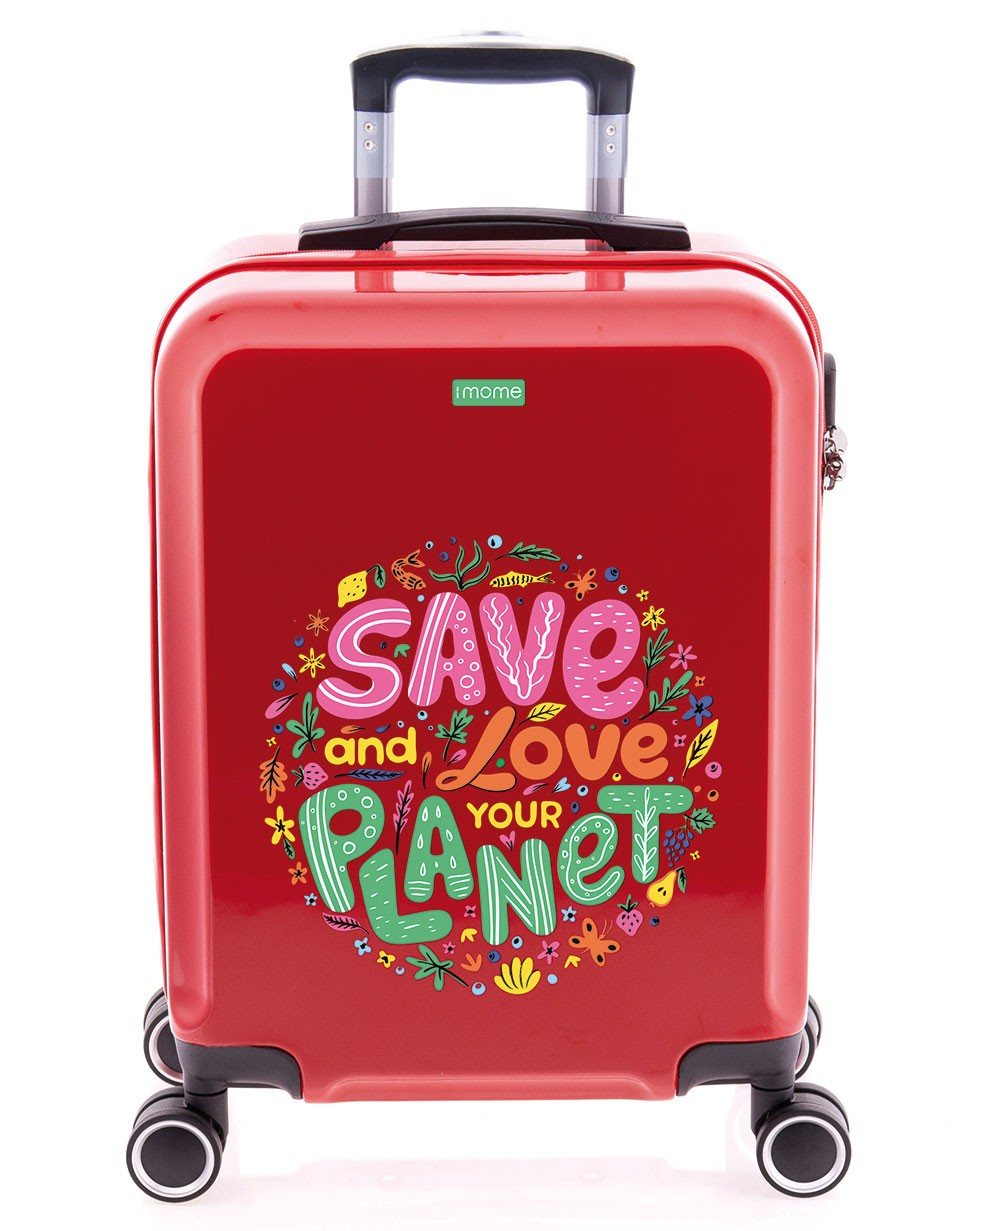 imome Cool Maleta De Mano Love Planet Planeta (Foto )